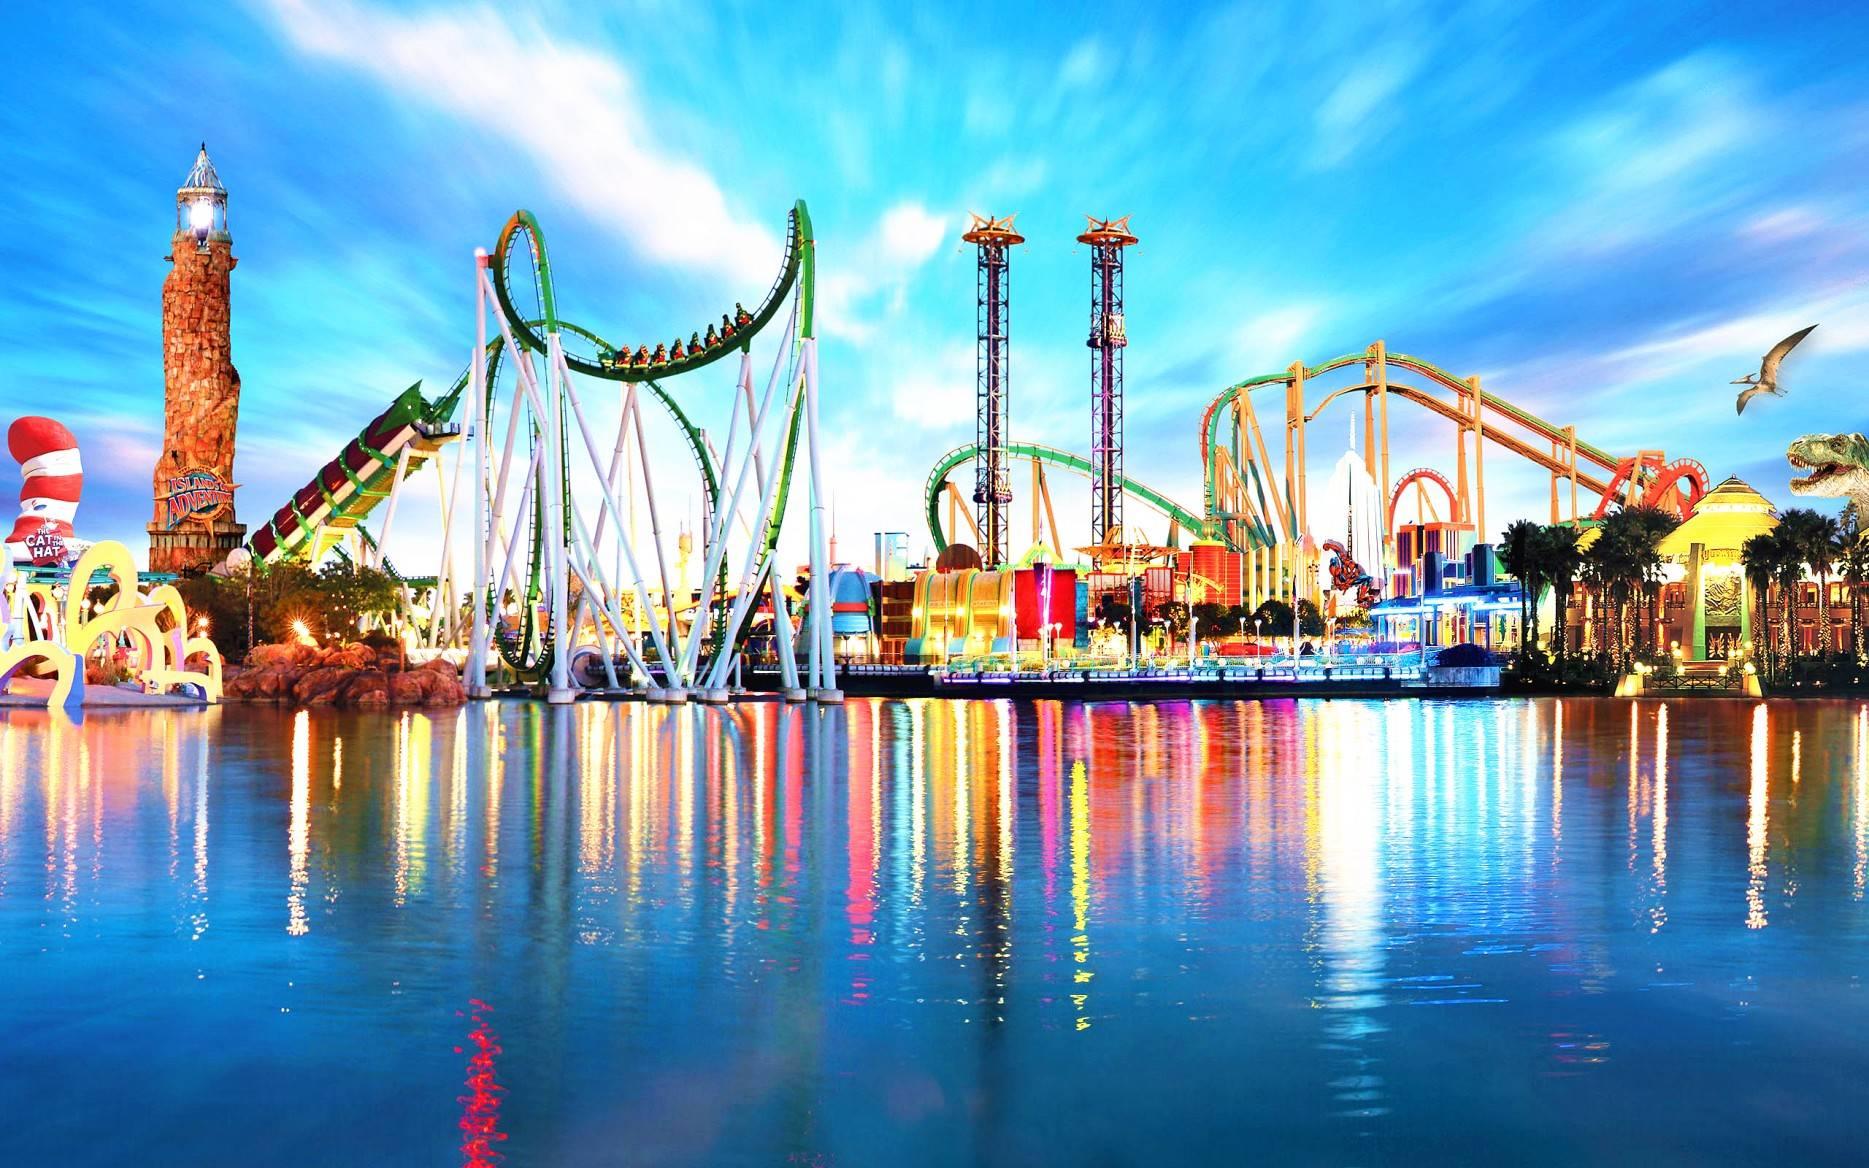 1-Day Universal Studios Florida (Admission Ticket)